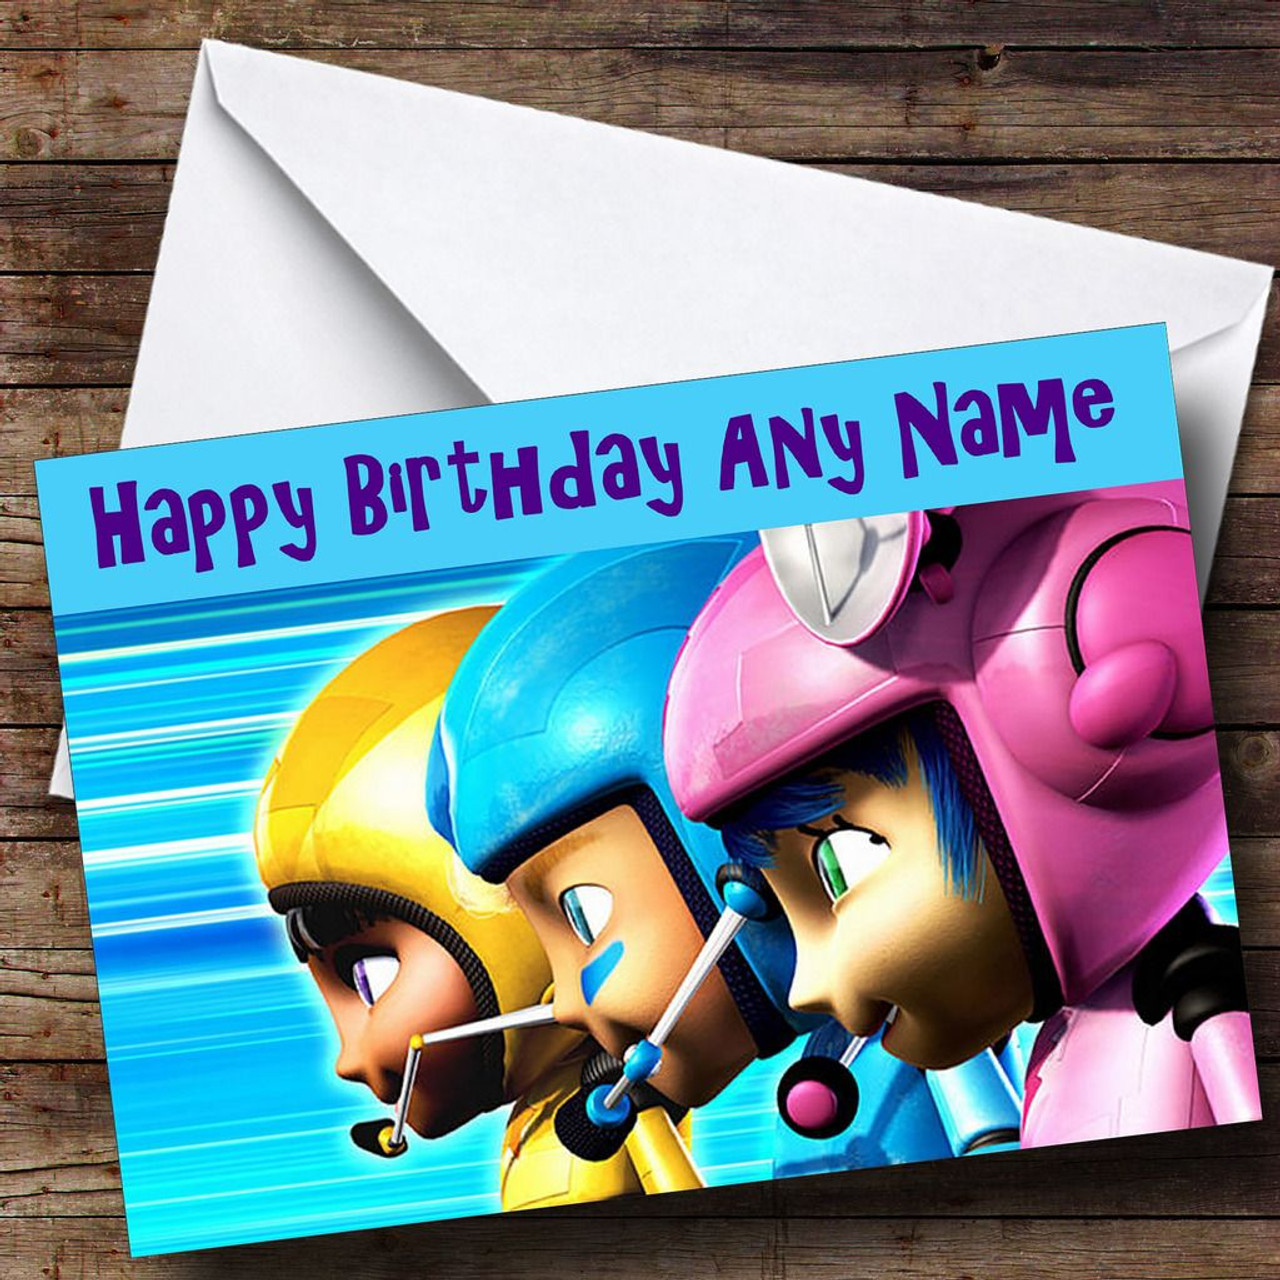 Kerwhizz Kids Personalised Birthday Card The Card Zoo – Personalised Birthday Cards for Kids